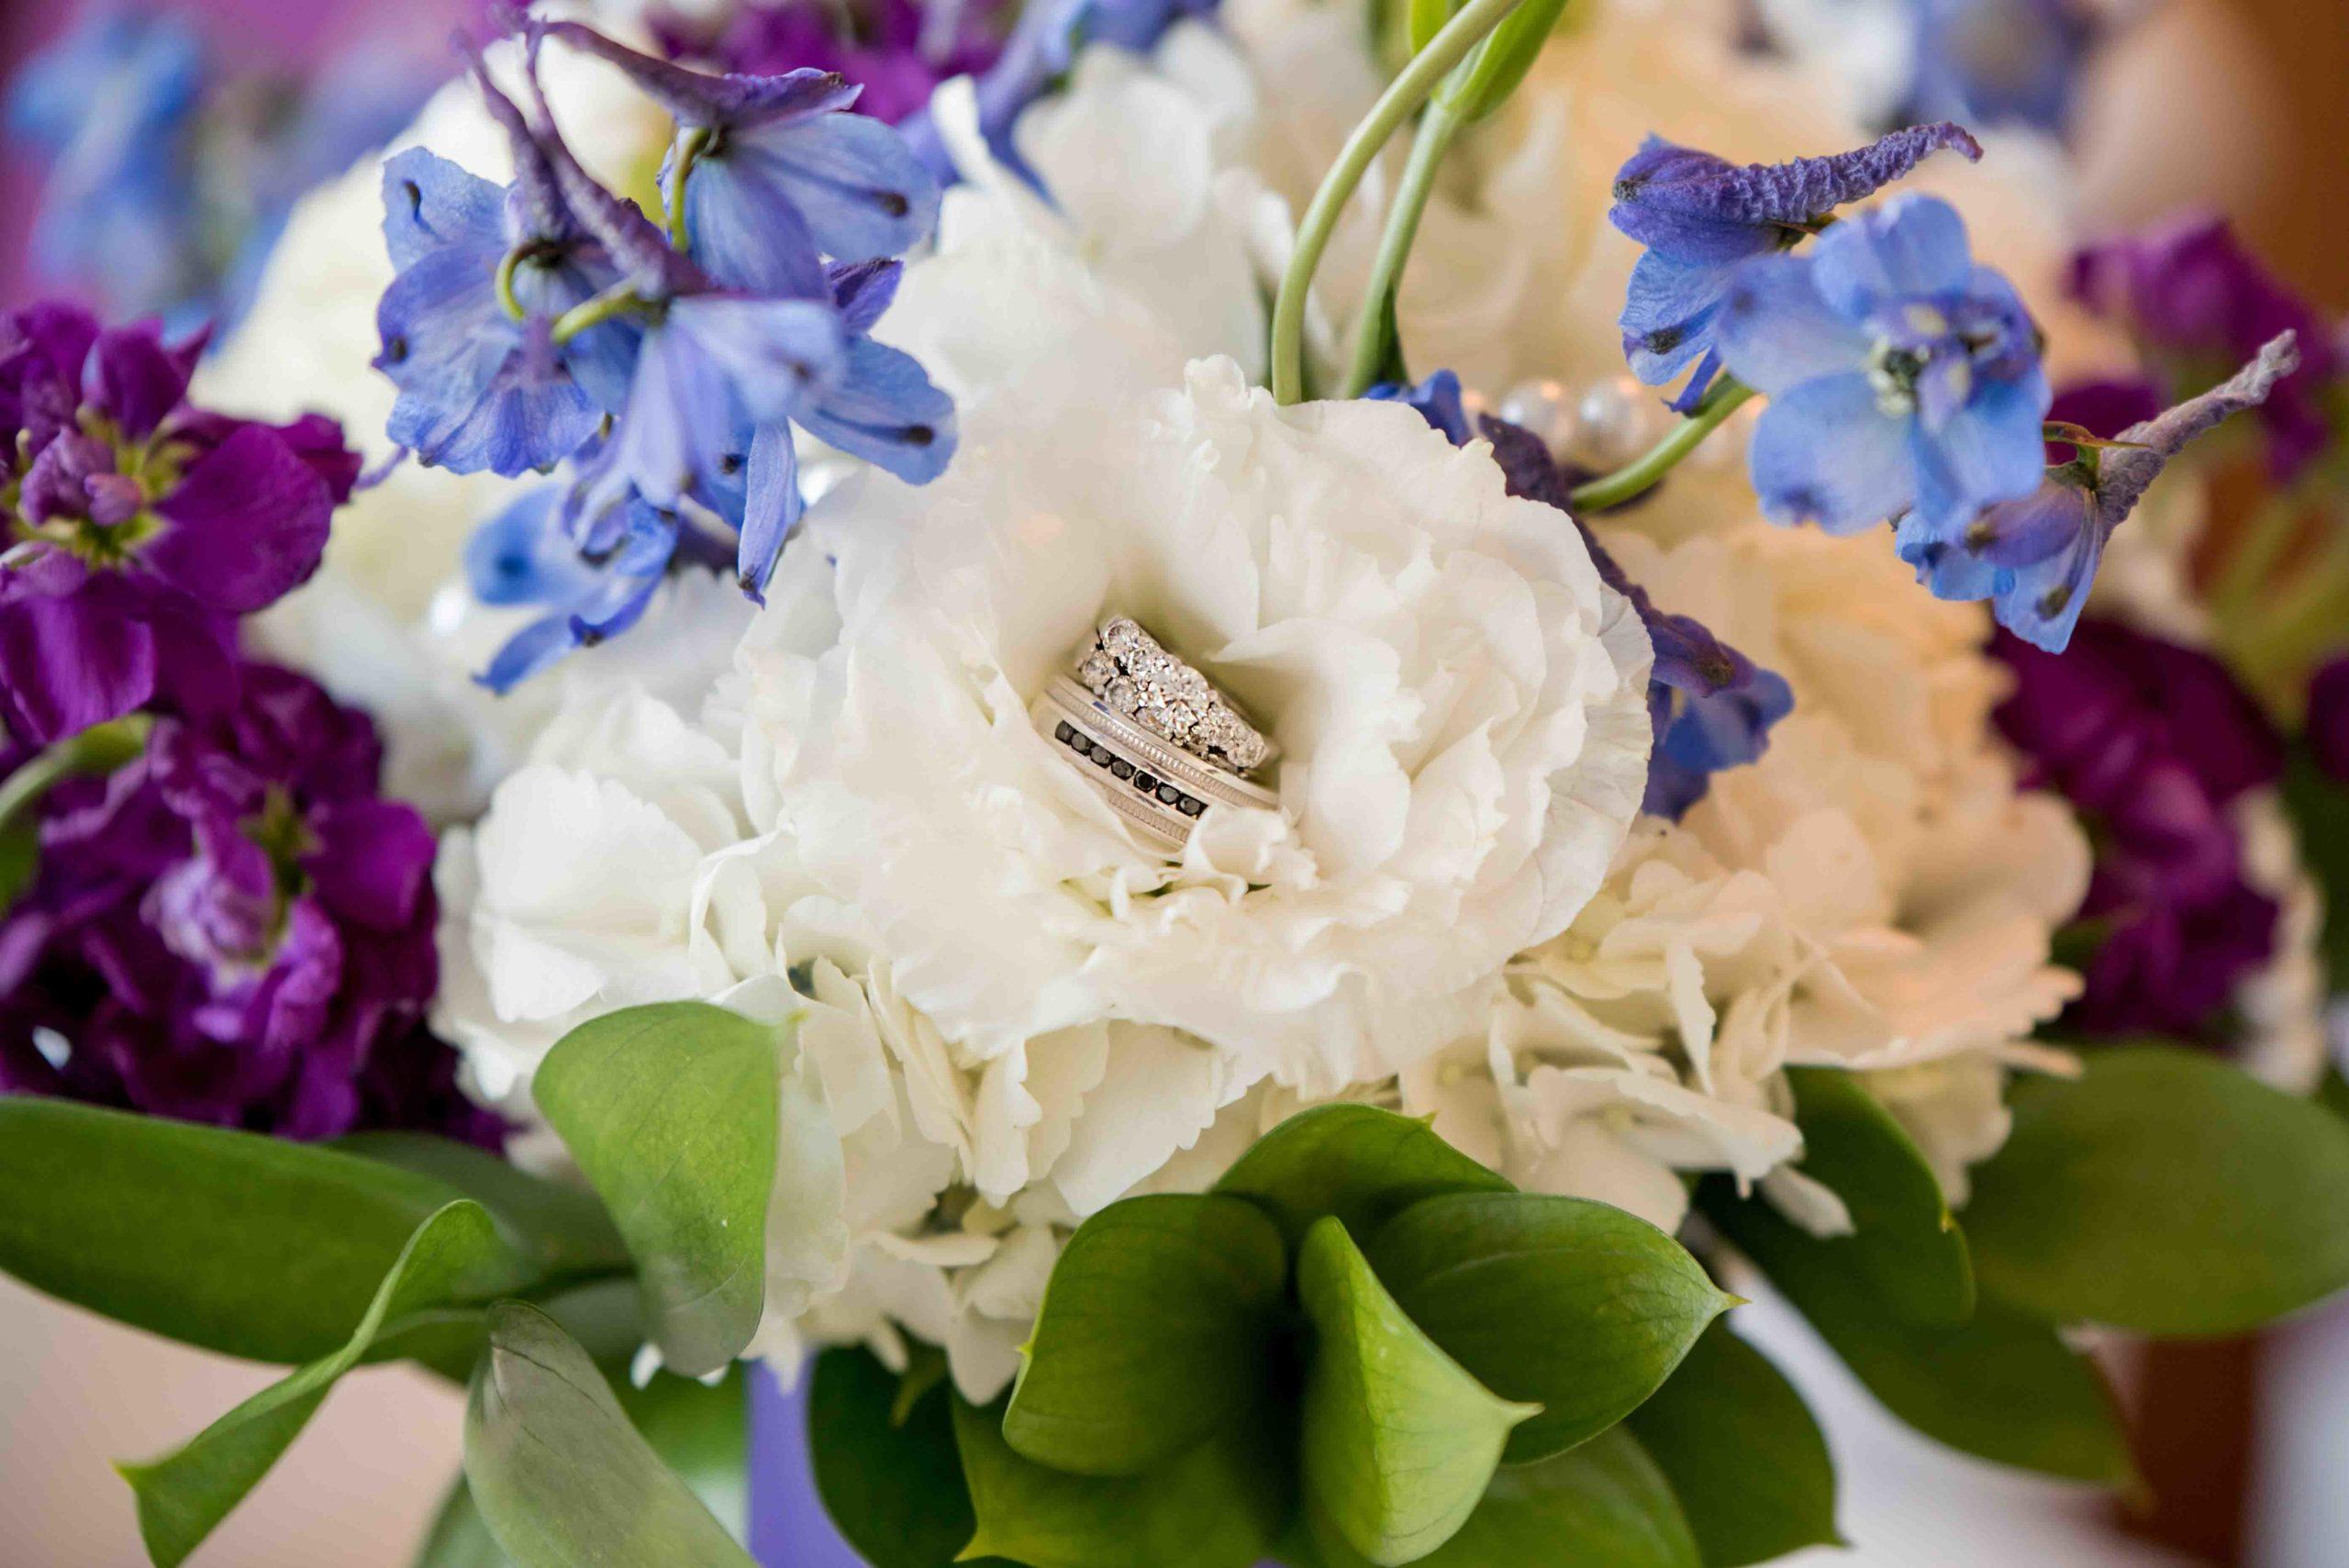 Wedding Ringe - Magnolia Blossom Cruises